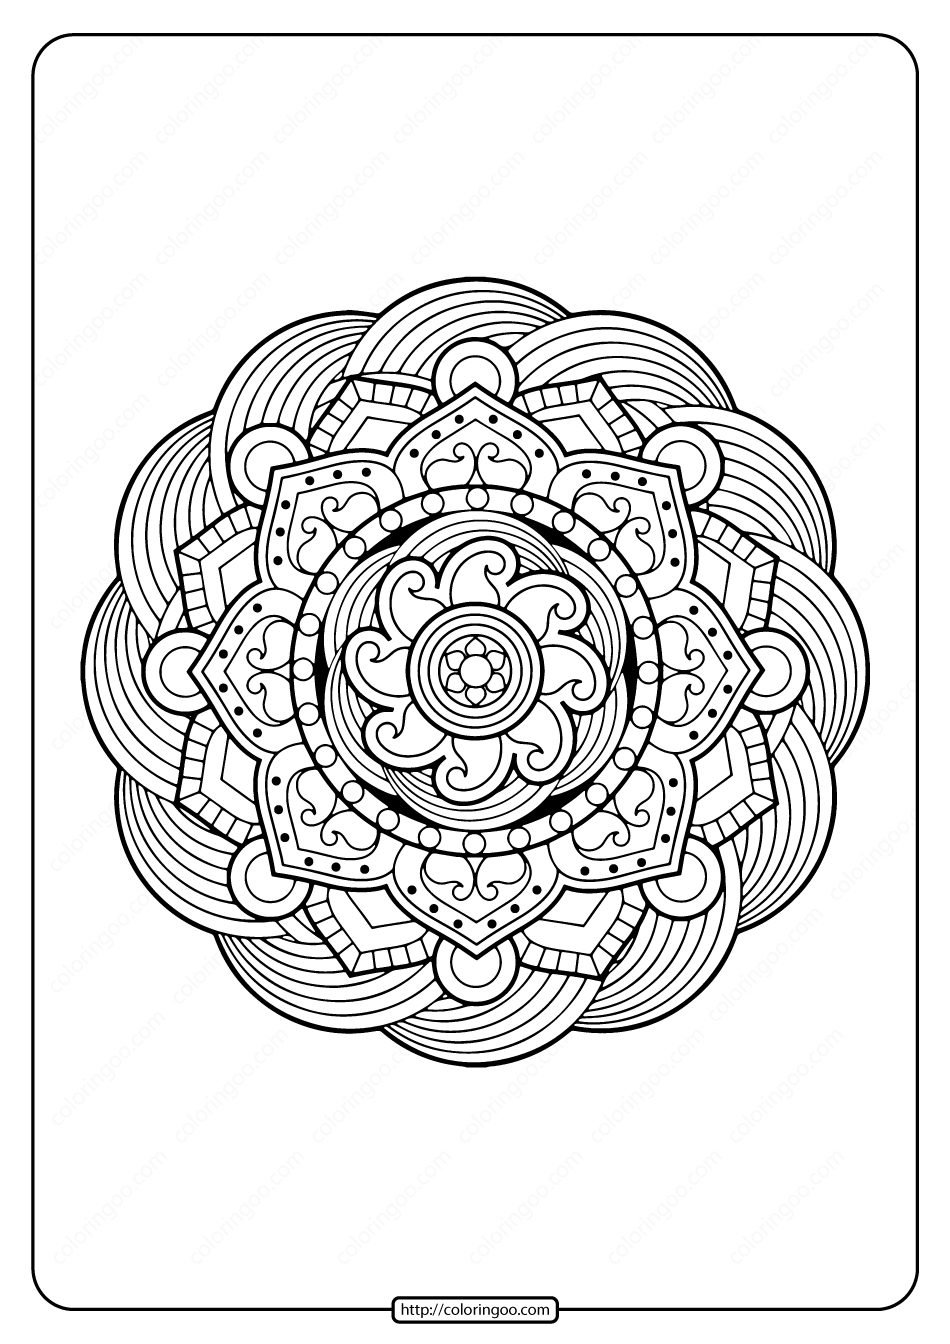 Free Printable Adult Floral Mandala Coloring Page 57